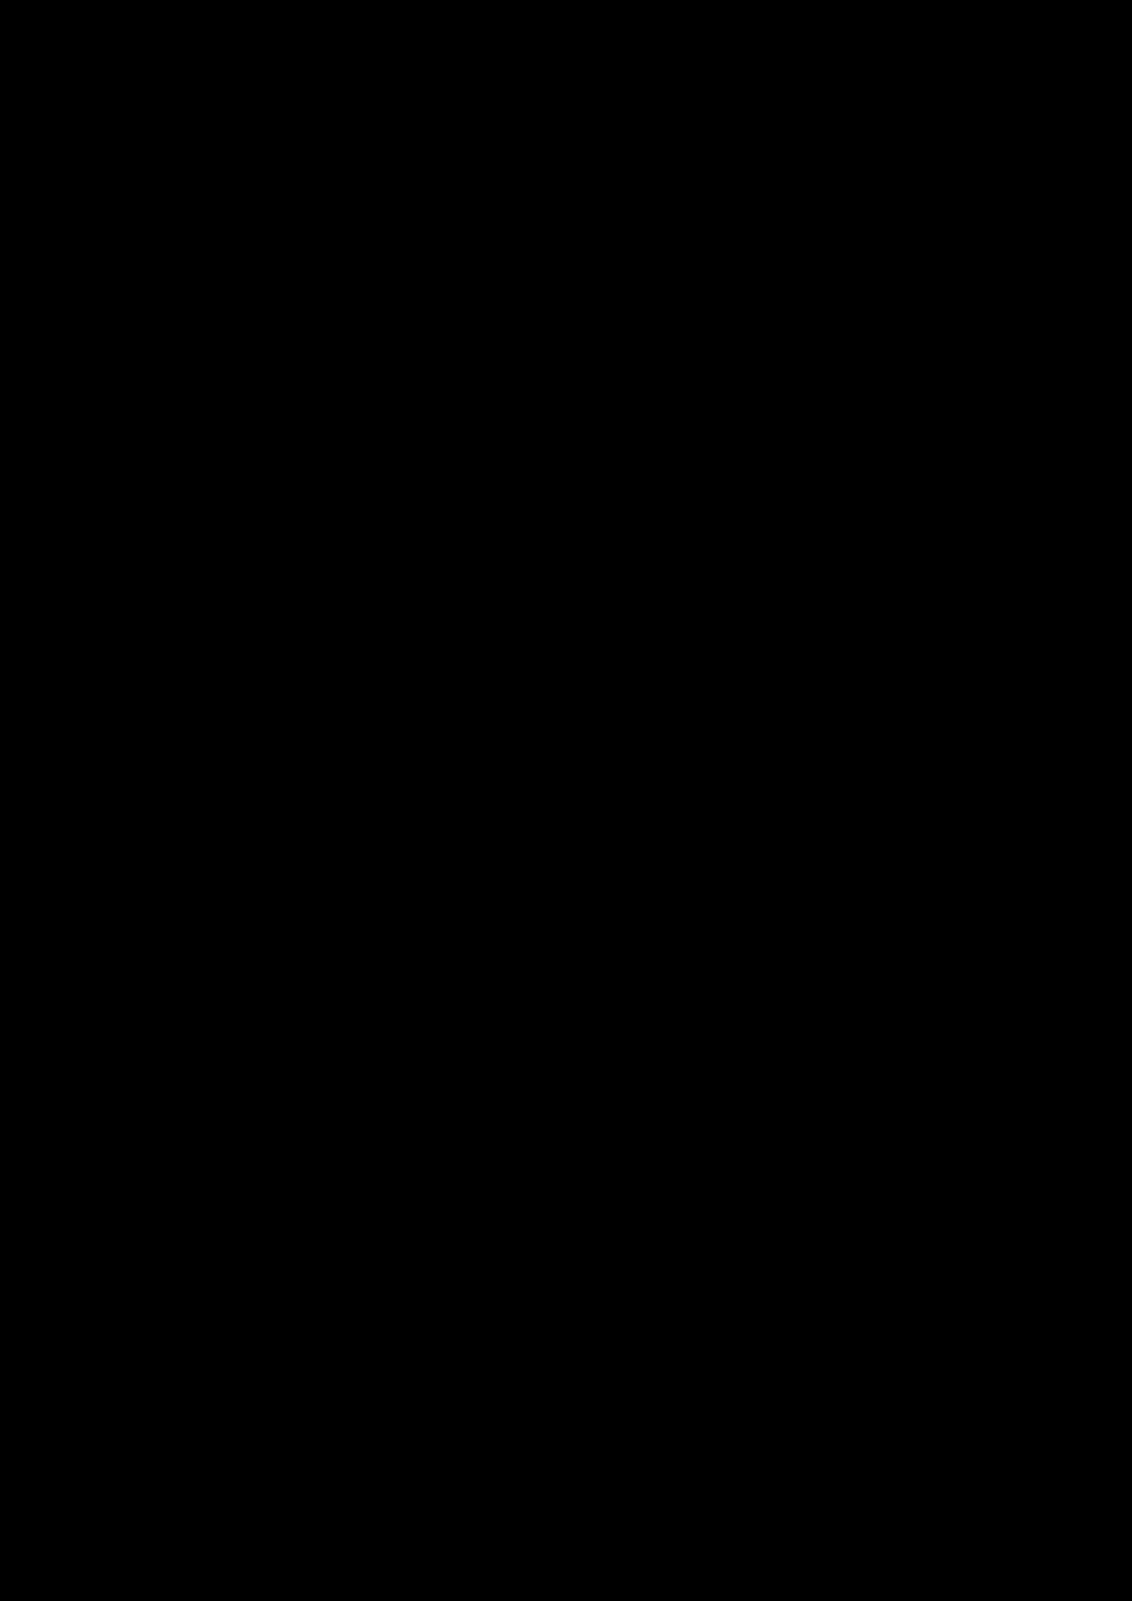 Belyiy sokol slide, Image 174